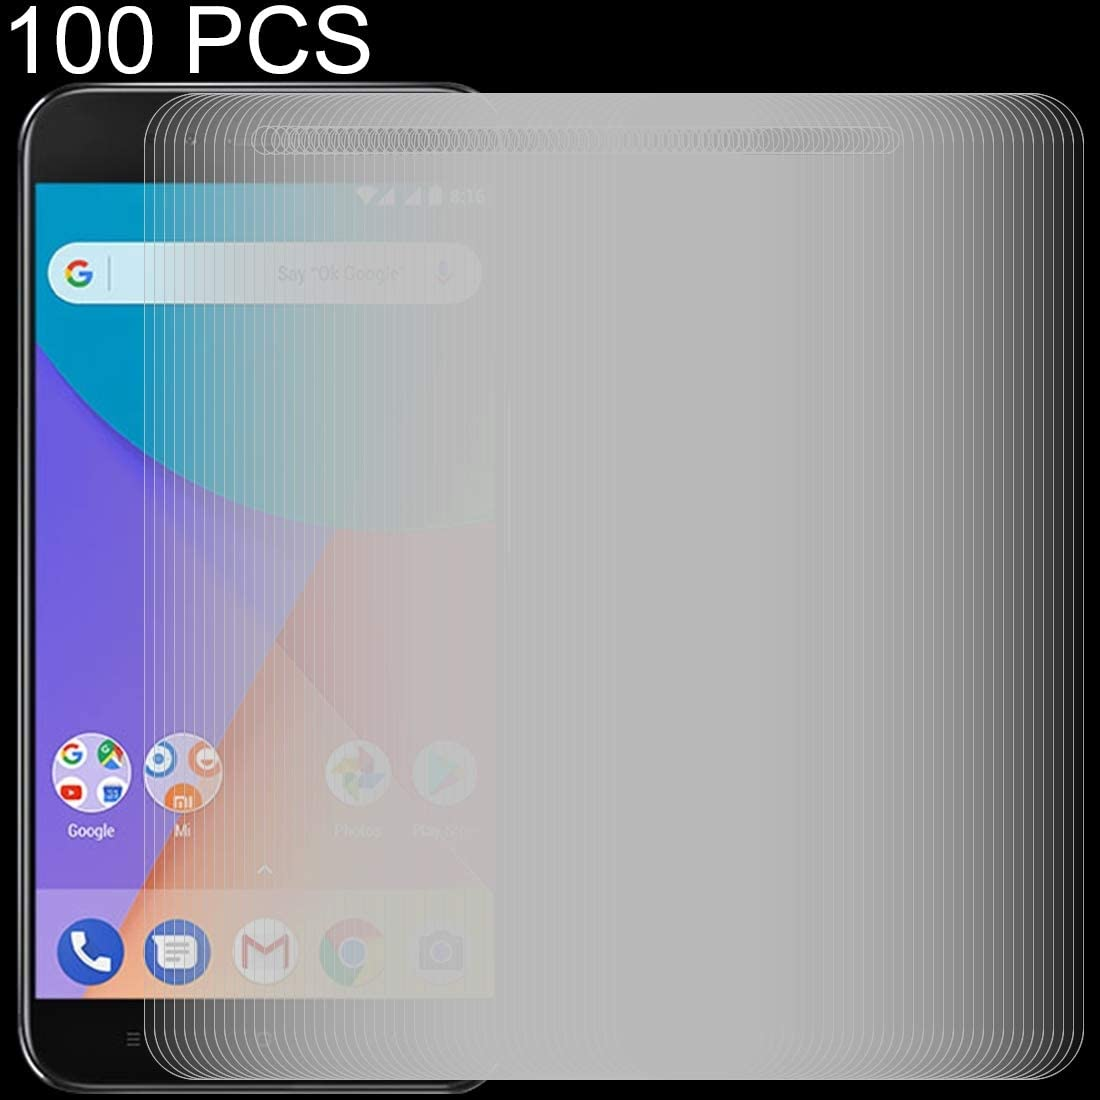 JIANGNIUS Screen Protector 100 PCS 0.26mm 9H 2.5D Tempered Glass Film for Xiaomi Mi A1